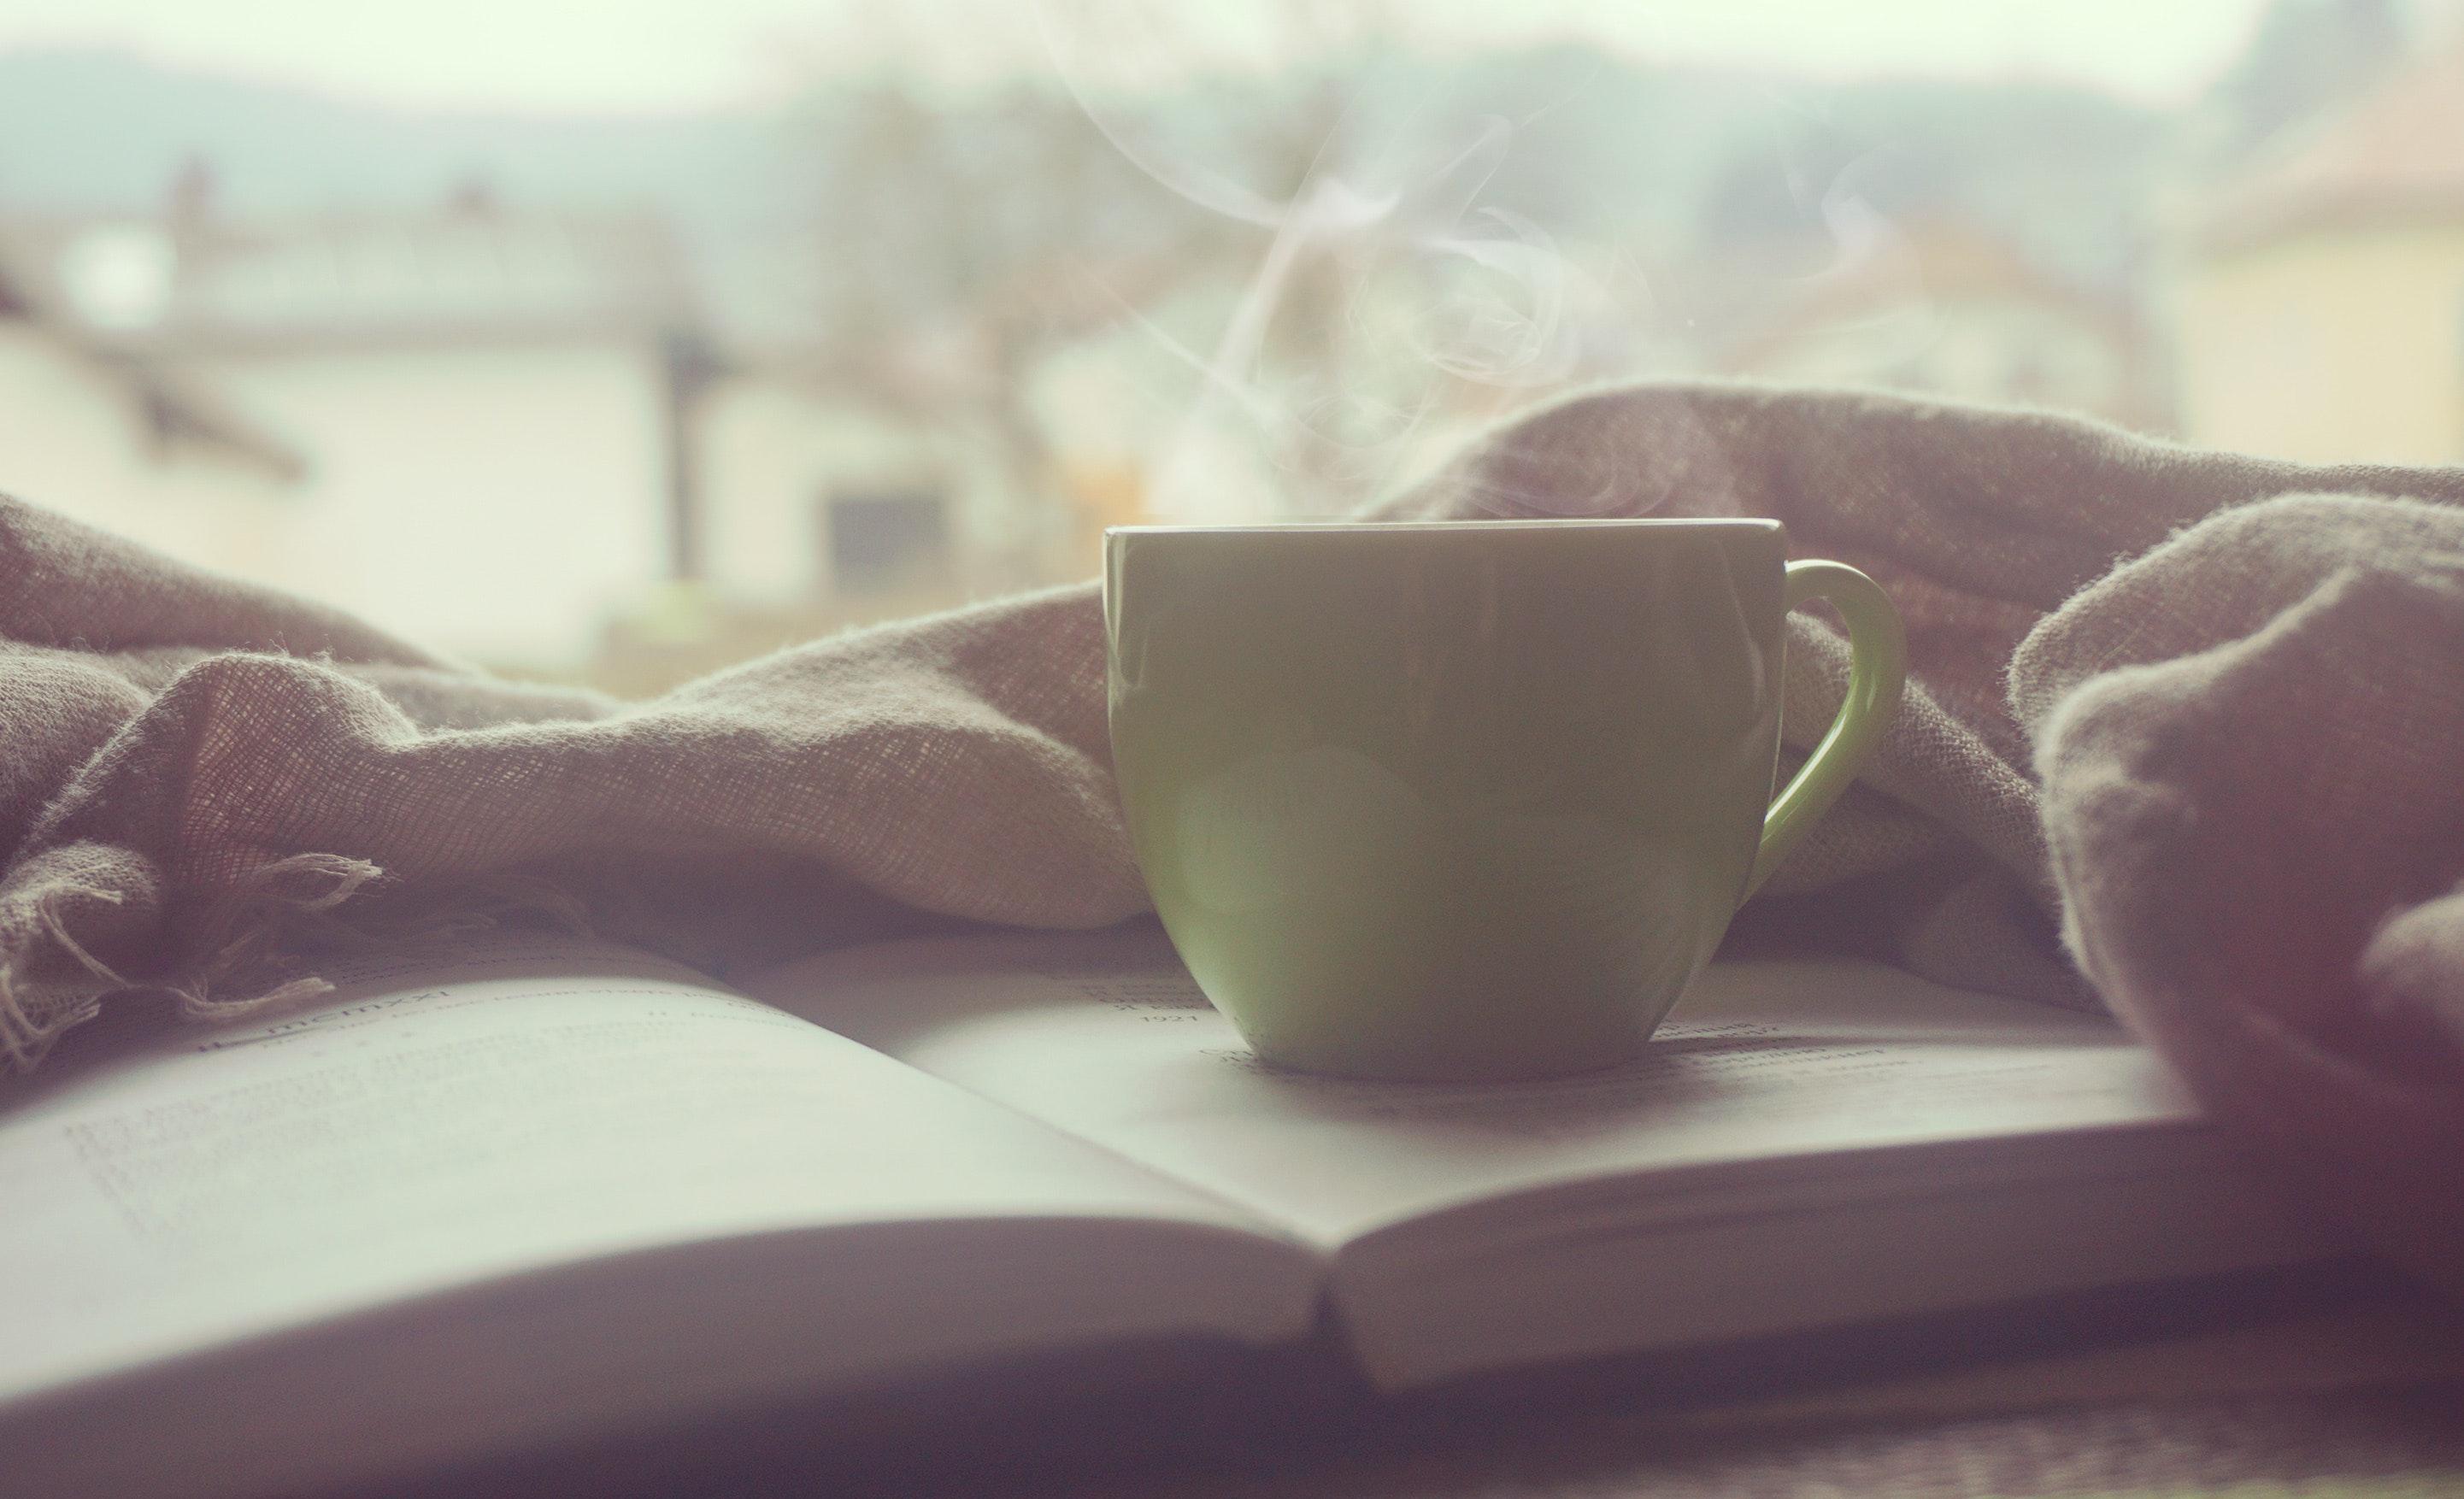 White hot mug on book near linen photo